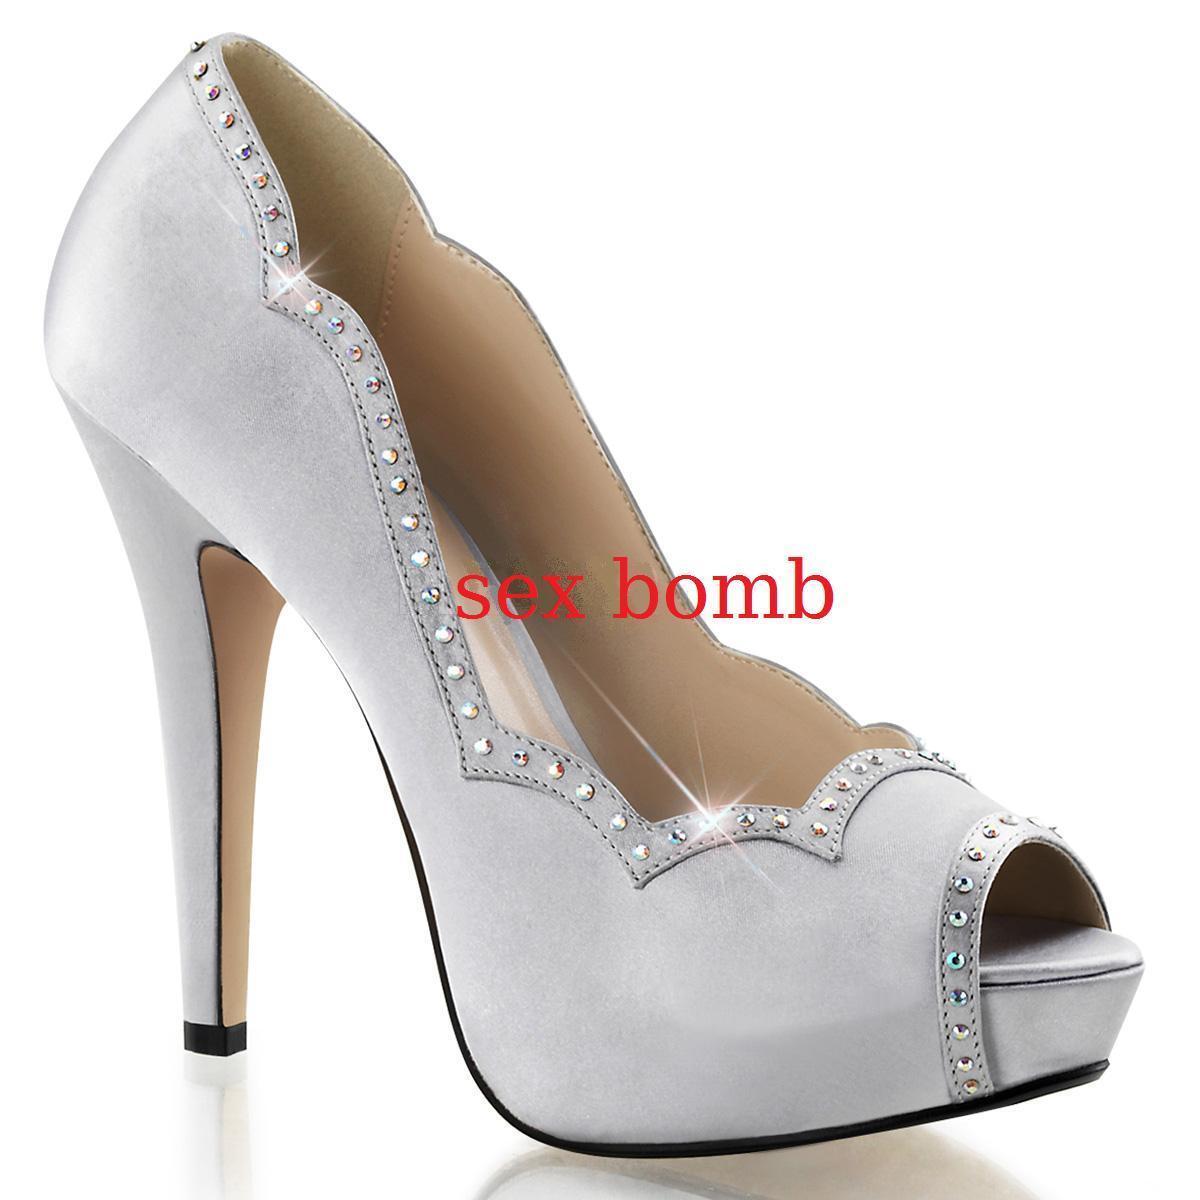 SEXY scarpe DECOLTE' STRASS tacco 13 dal 35 satin al 41 ARGENTO